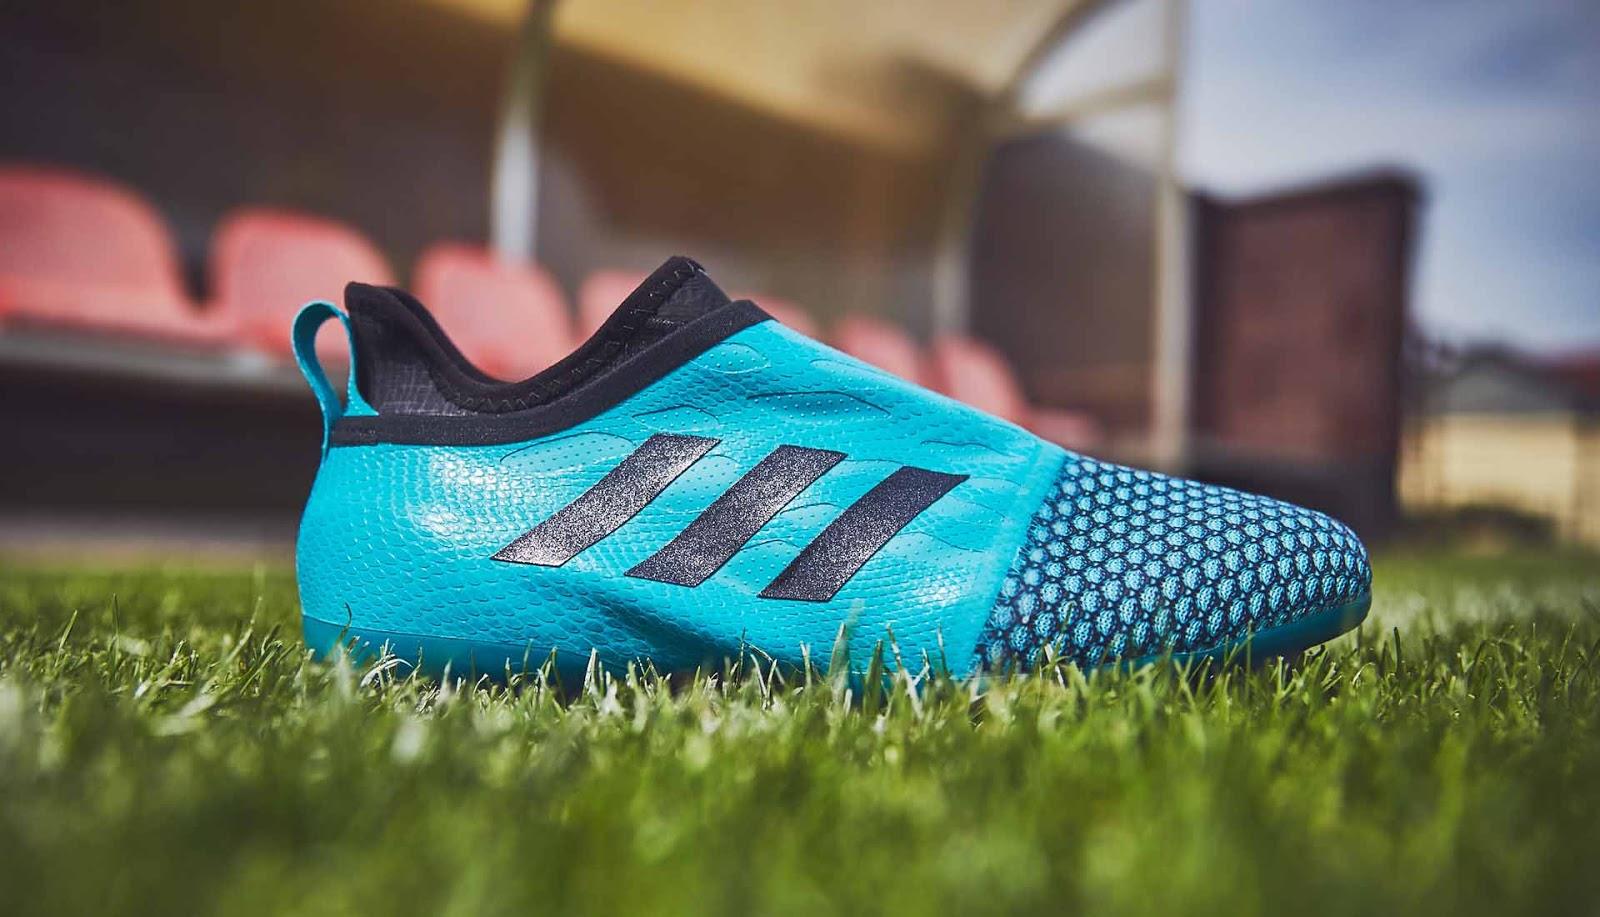 huge discount 973e2 11cae Aqua Blue Adidas Glitch Fluido Agilityknit Skin Released